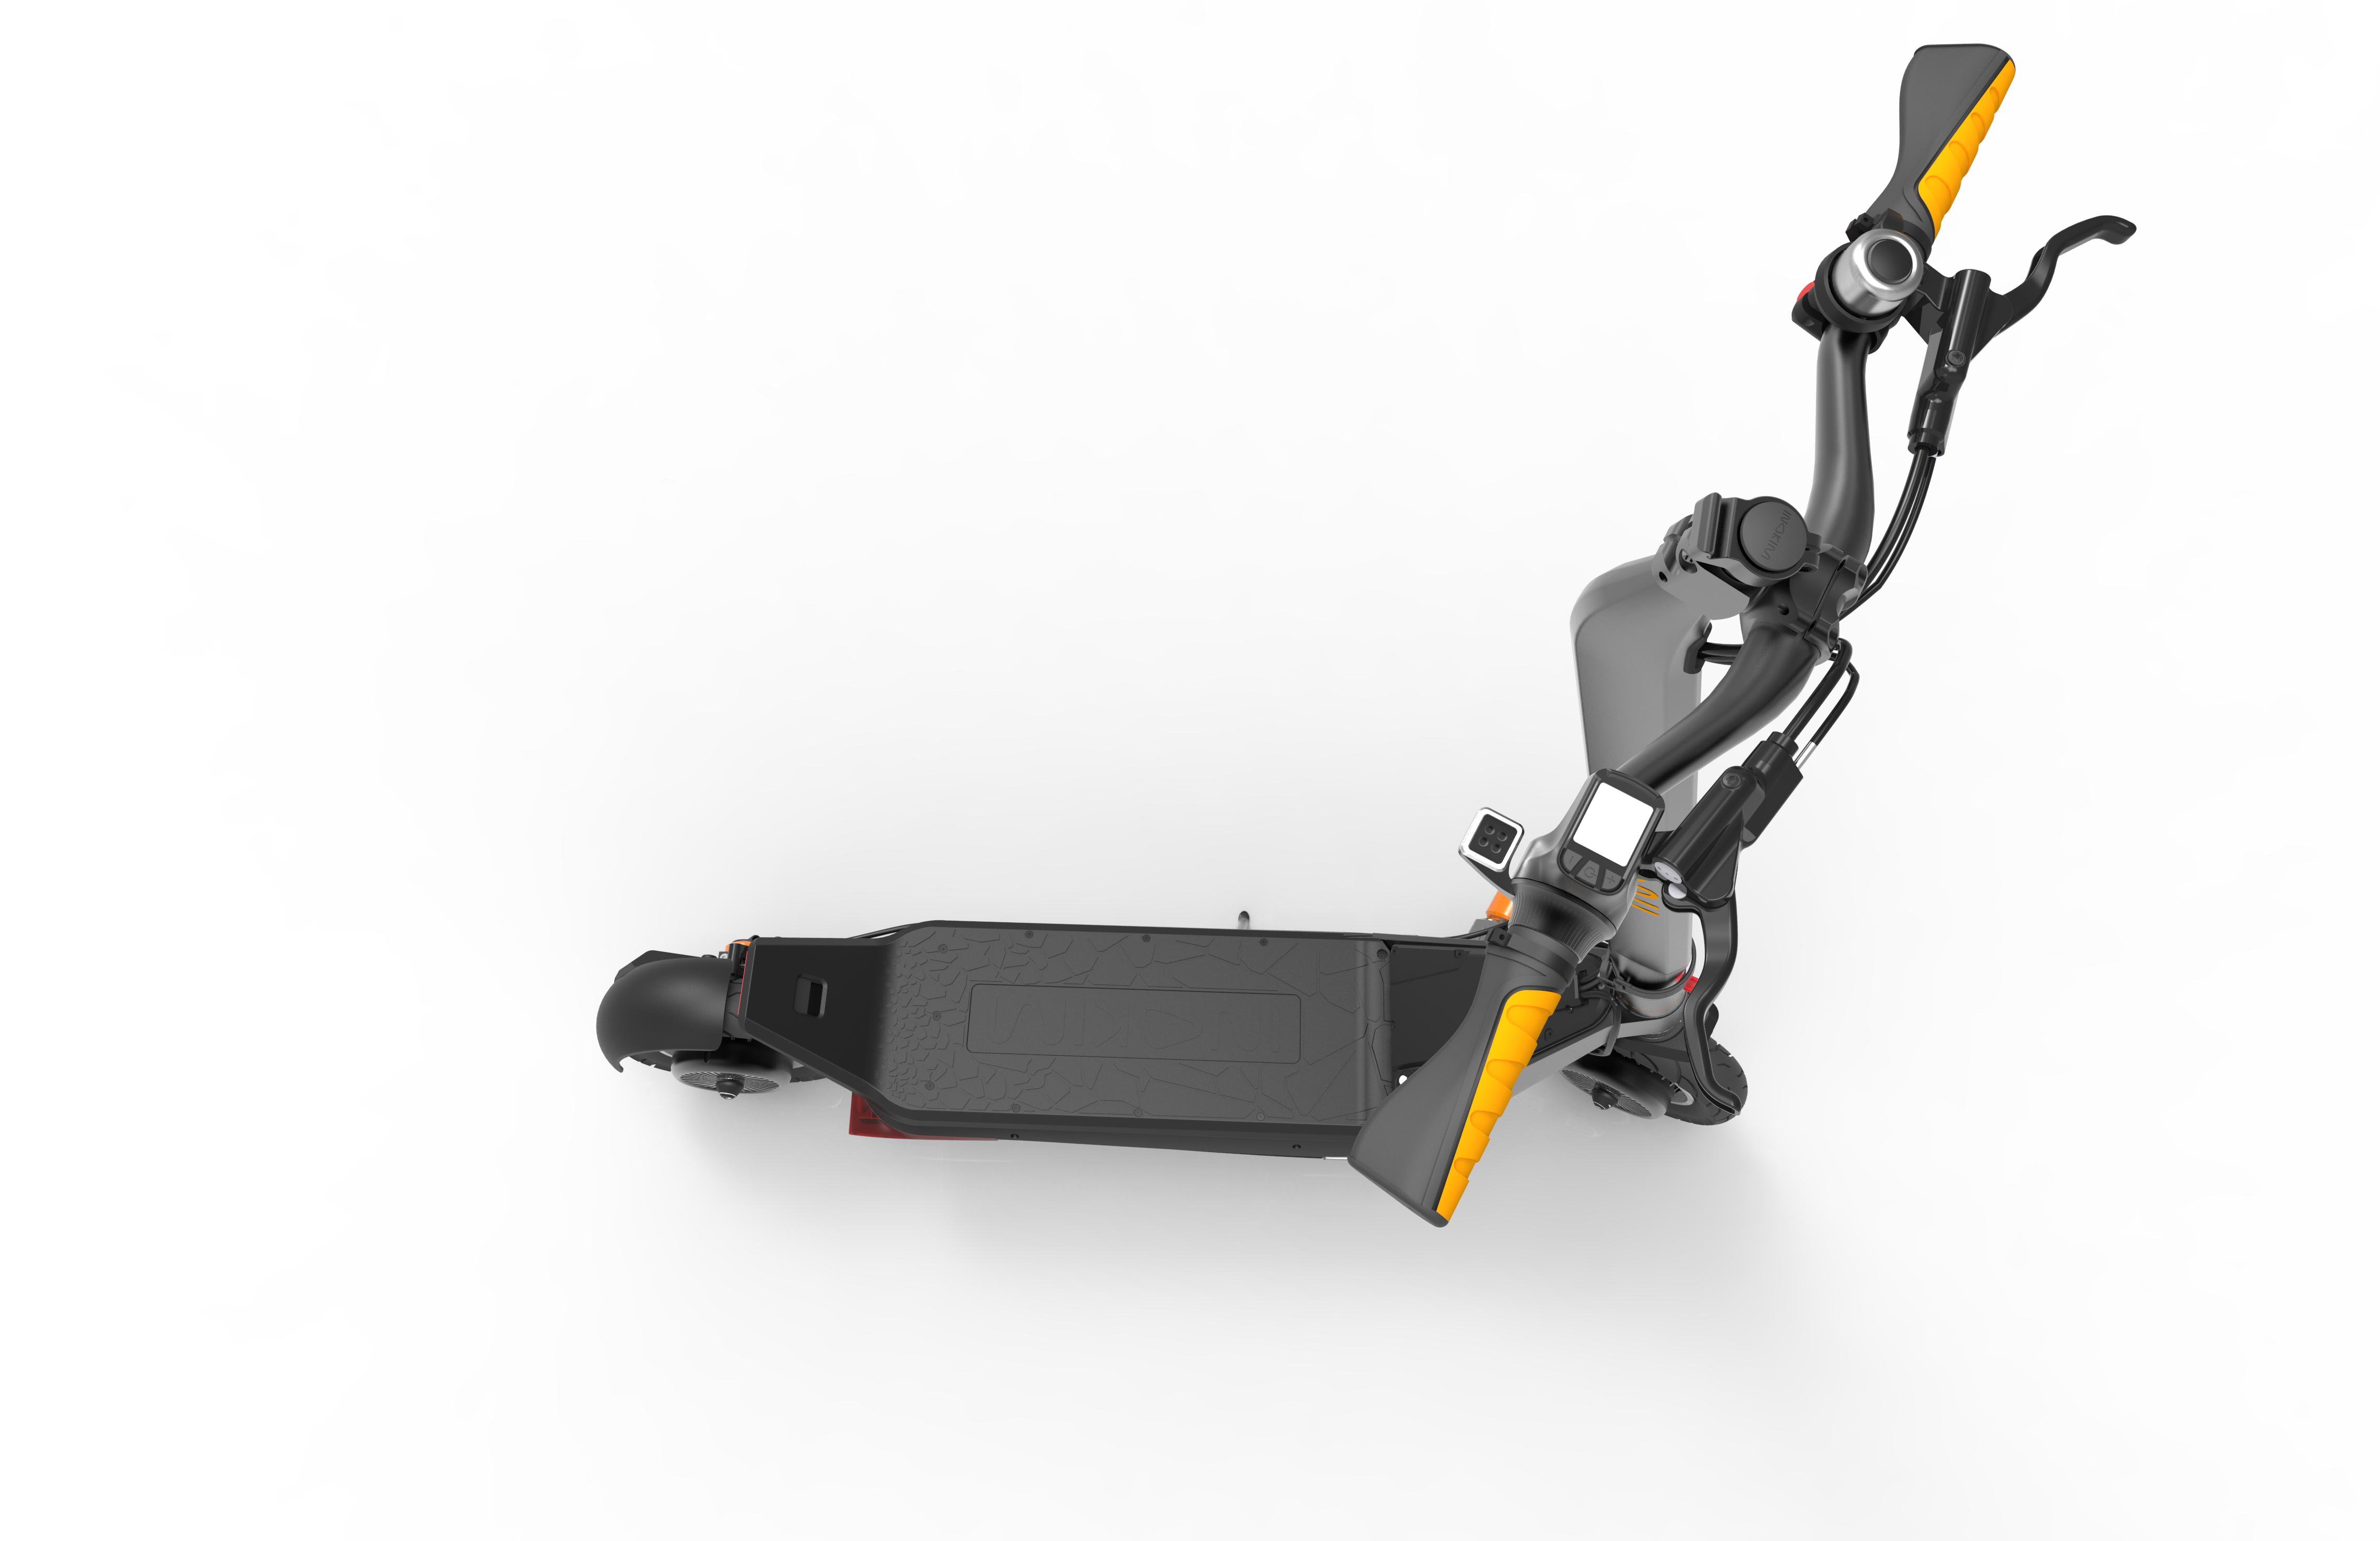 Inokim OX OXO eScooter